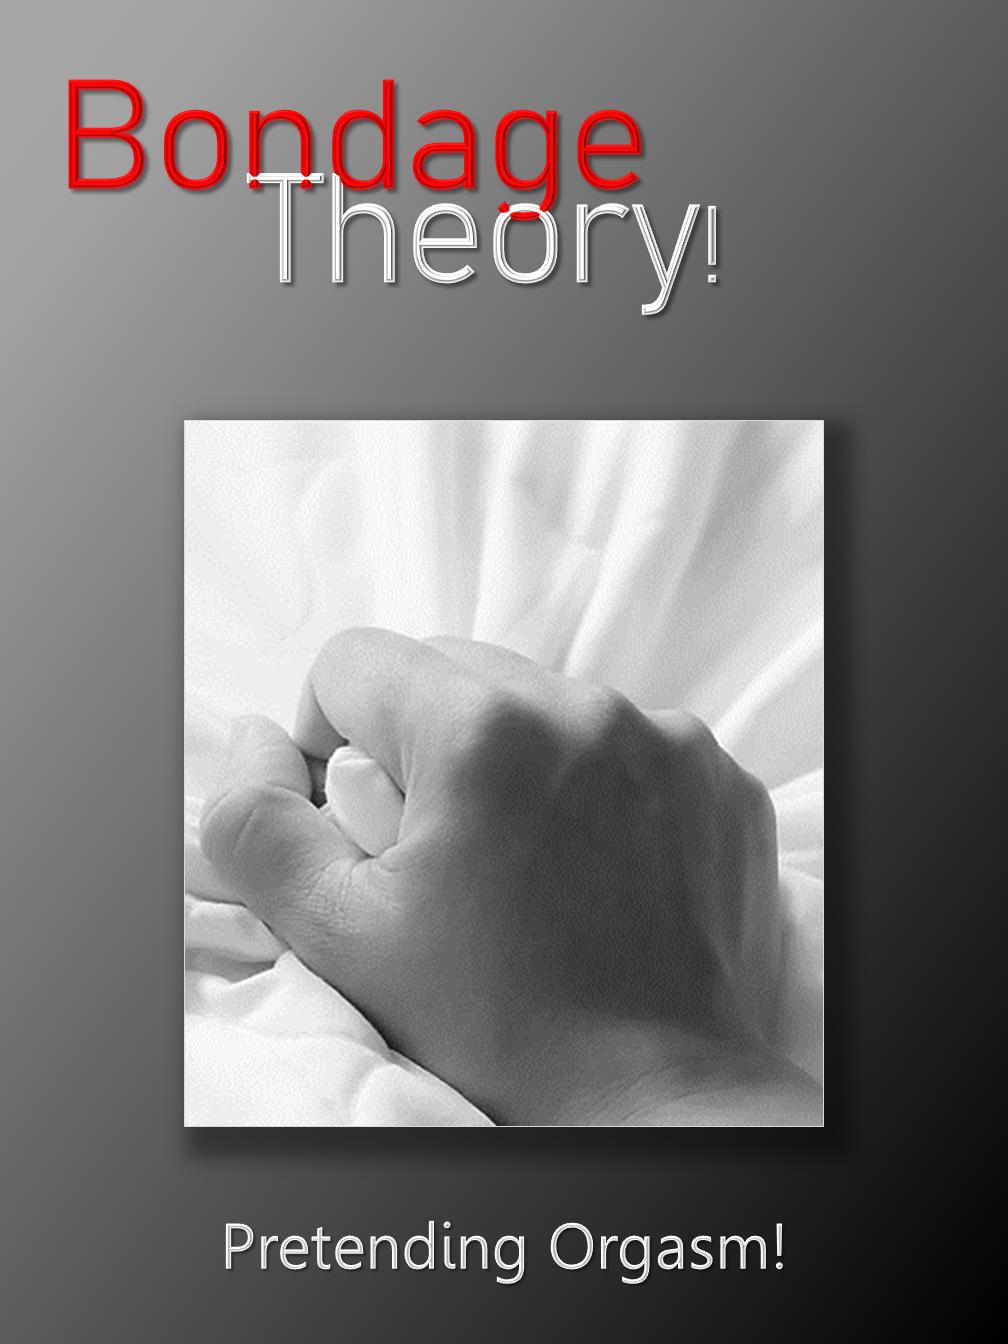 Bontage Theory